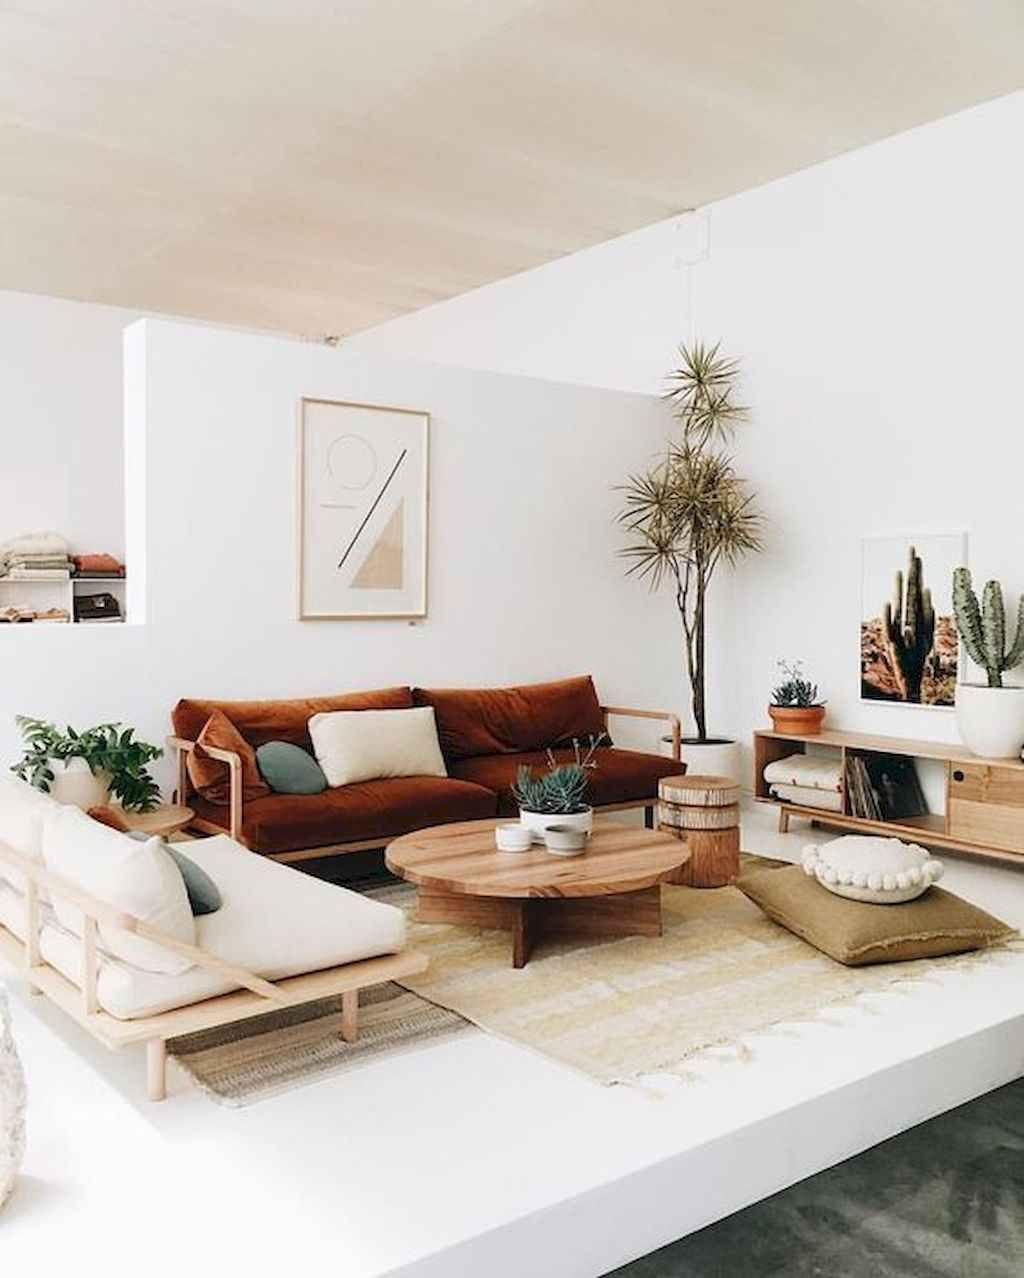 8 Mid Century Modern Living Room Decor Ideas - spaciroom.com